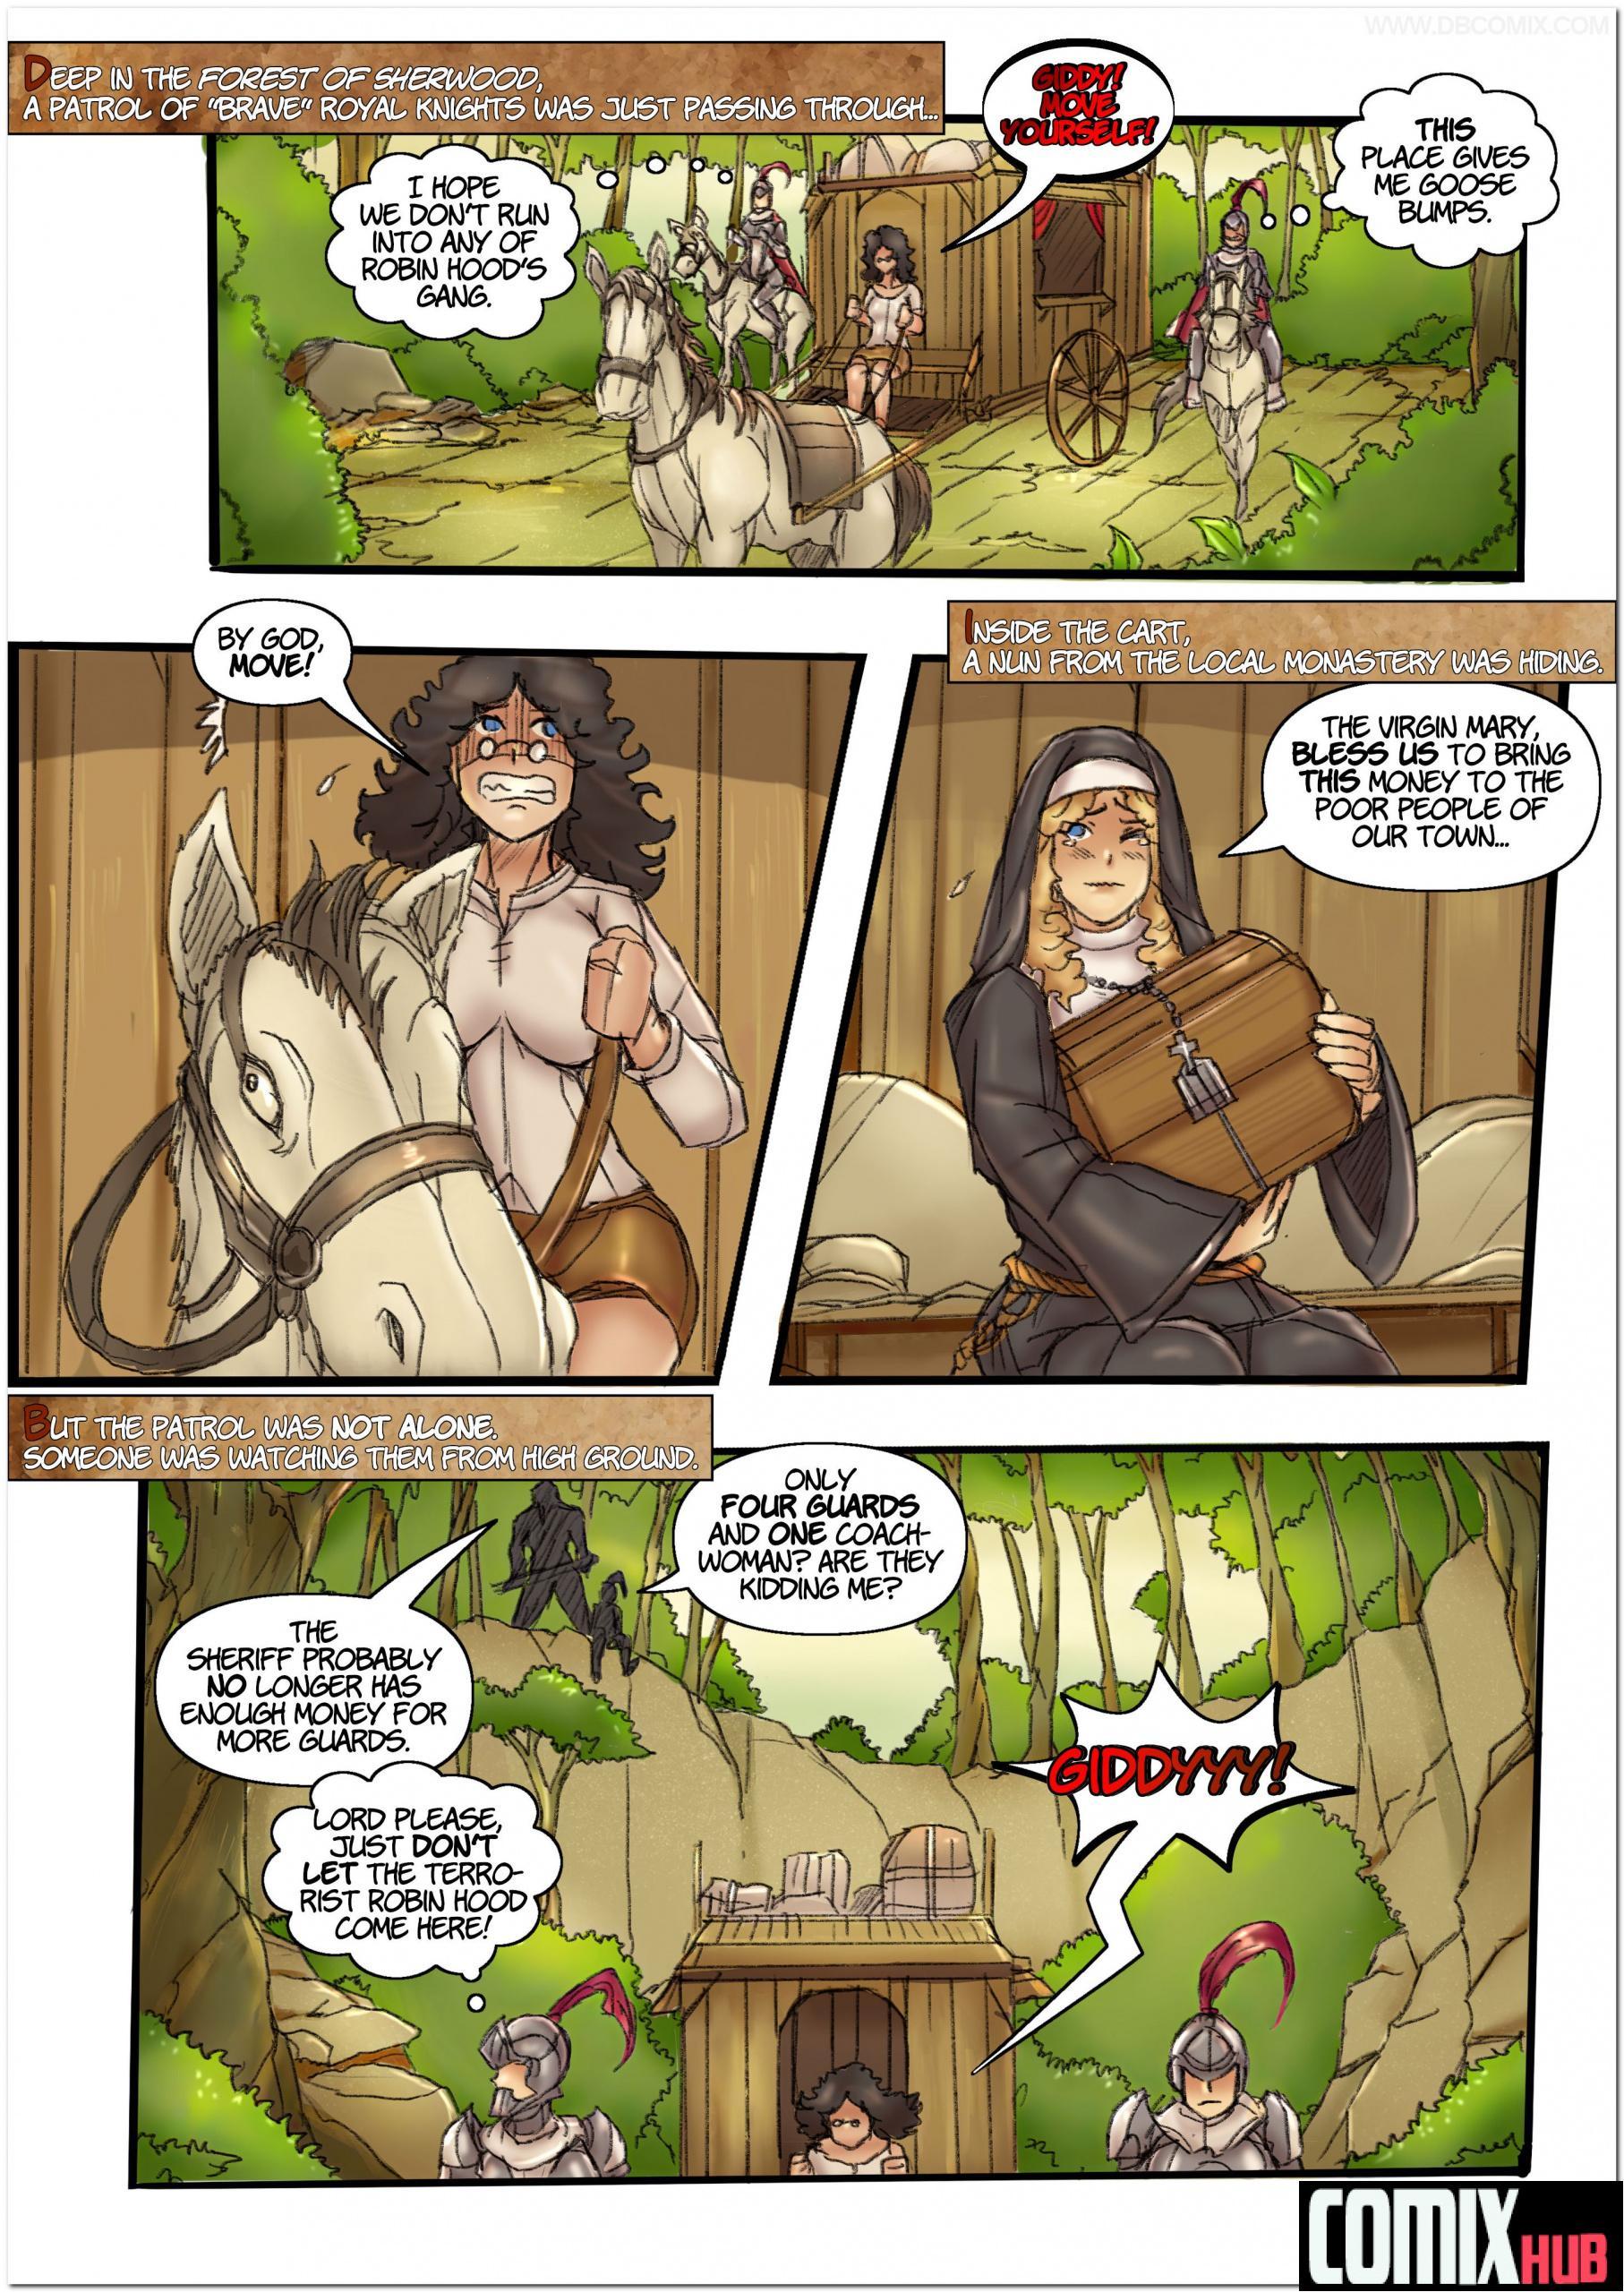 Porn comics, Robin Hood the Queen of Thieves 1 Oral sex, BDSM, Big Tits, Bondage, cunnilingus, Latex, Lesbians, Stockings